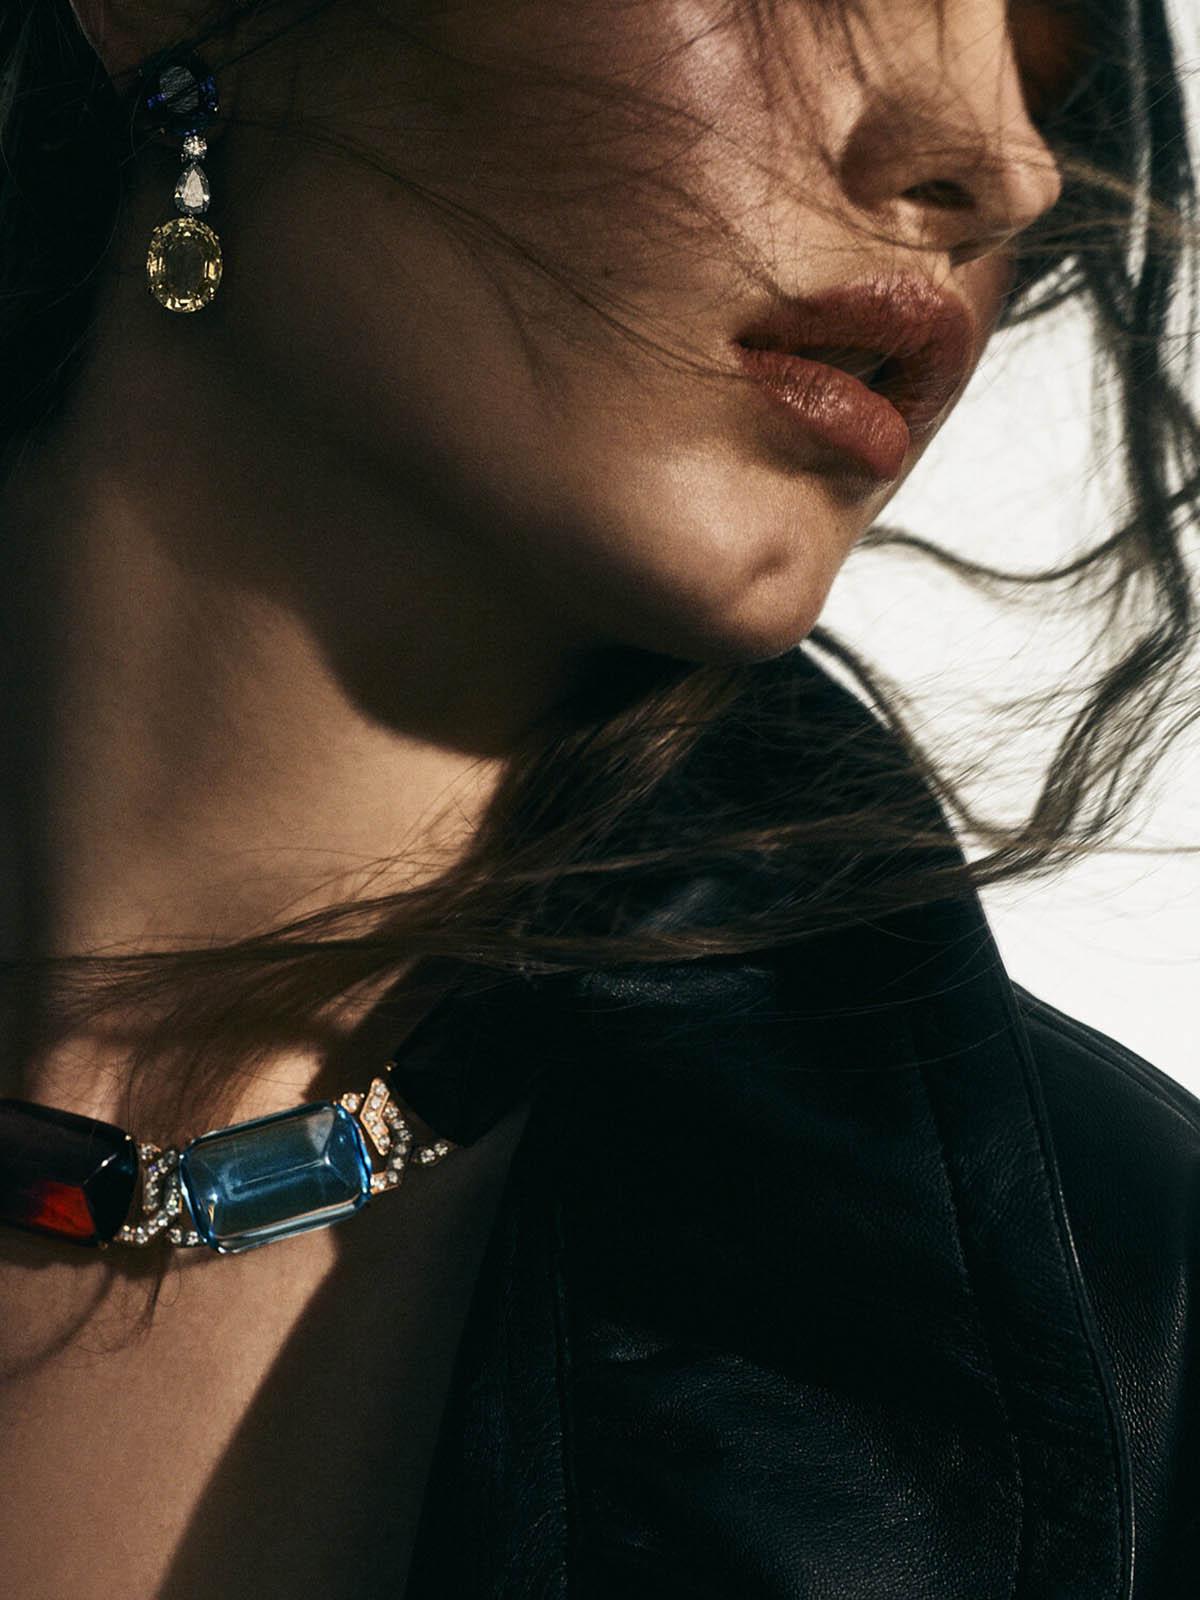 Ansolet Rossouw by Yulia Gorbachenko for Vogue Mexico & Latin America April 2021